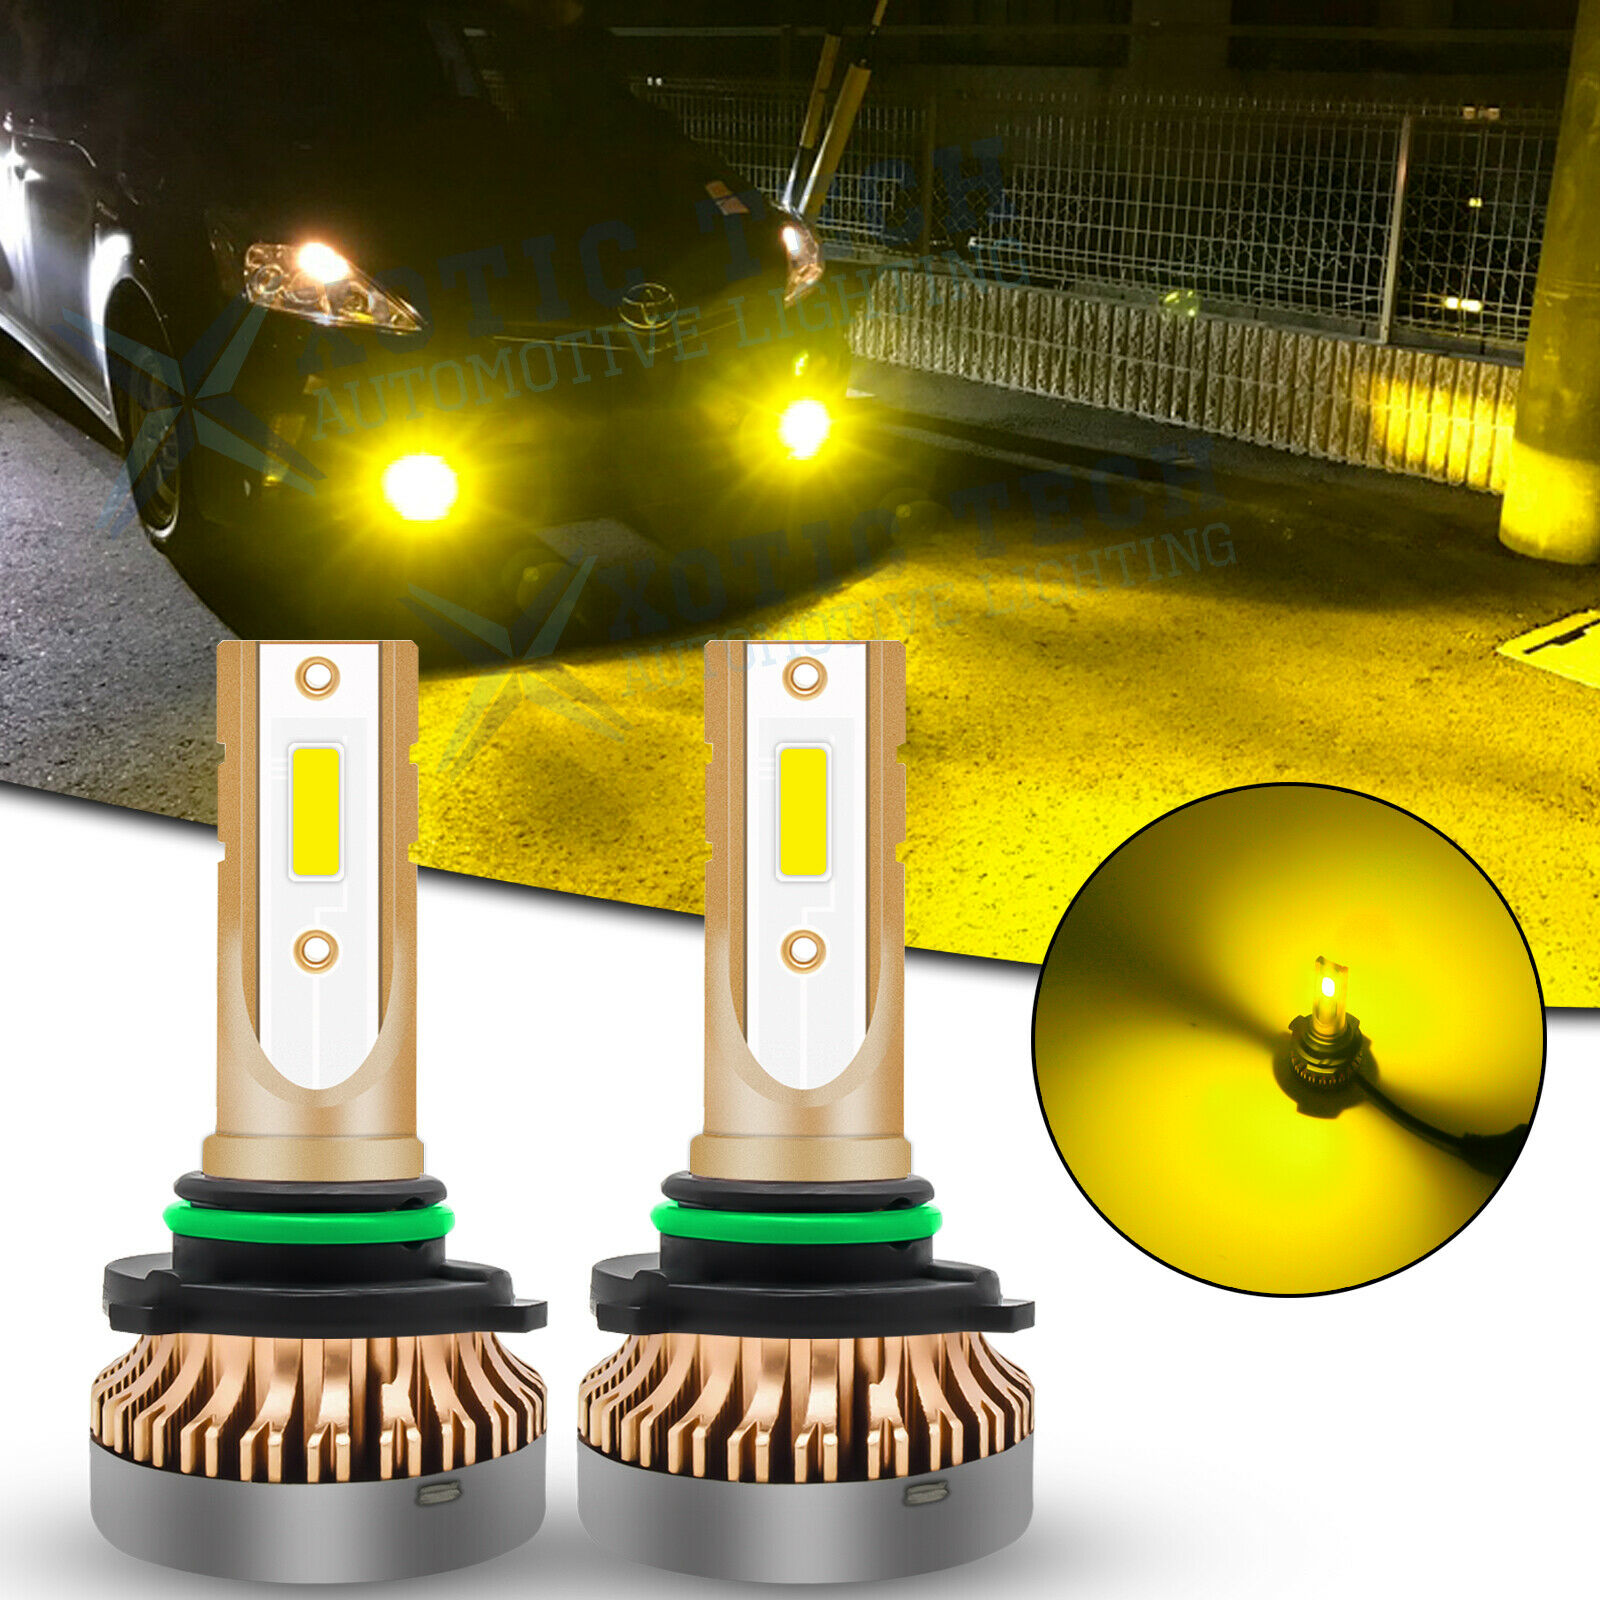 Replacement for Light Bulb//Lamp Lr58060 40-watt Light Bulb by Technical Precision